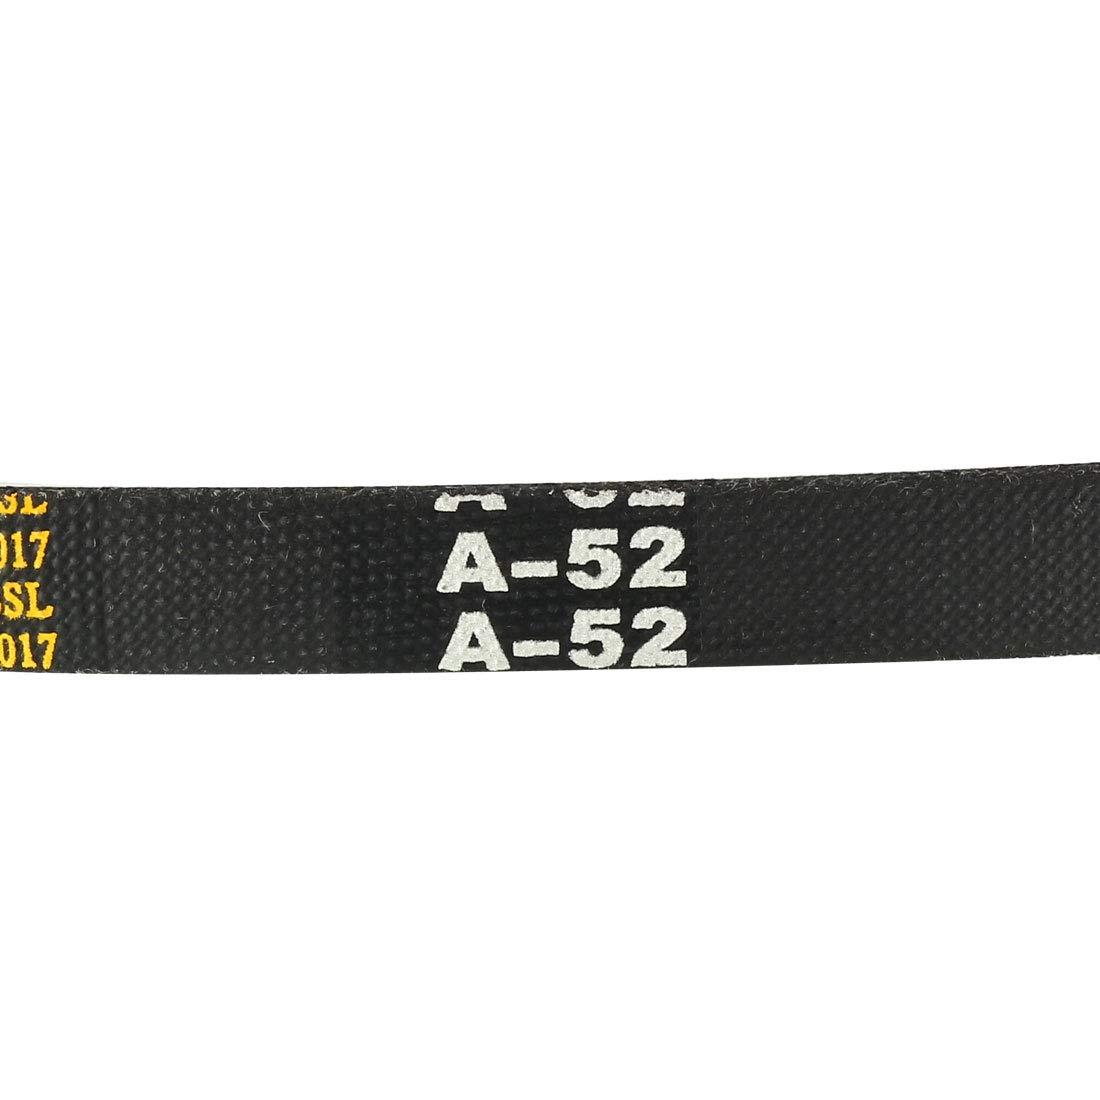 uxcell A-47 Drive V-Belt Girth 47-inch Industrial Power Rubber Transmission Belt